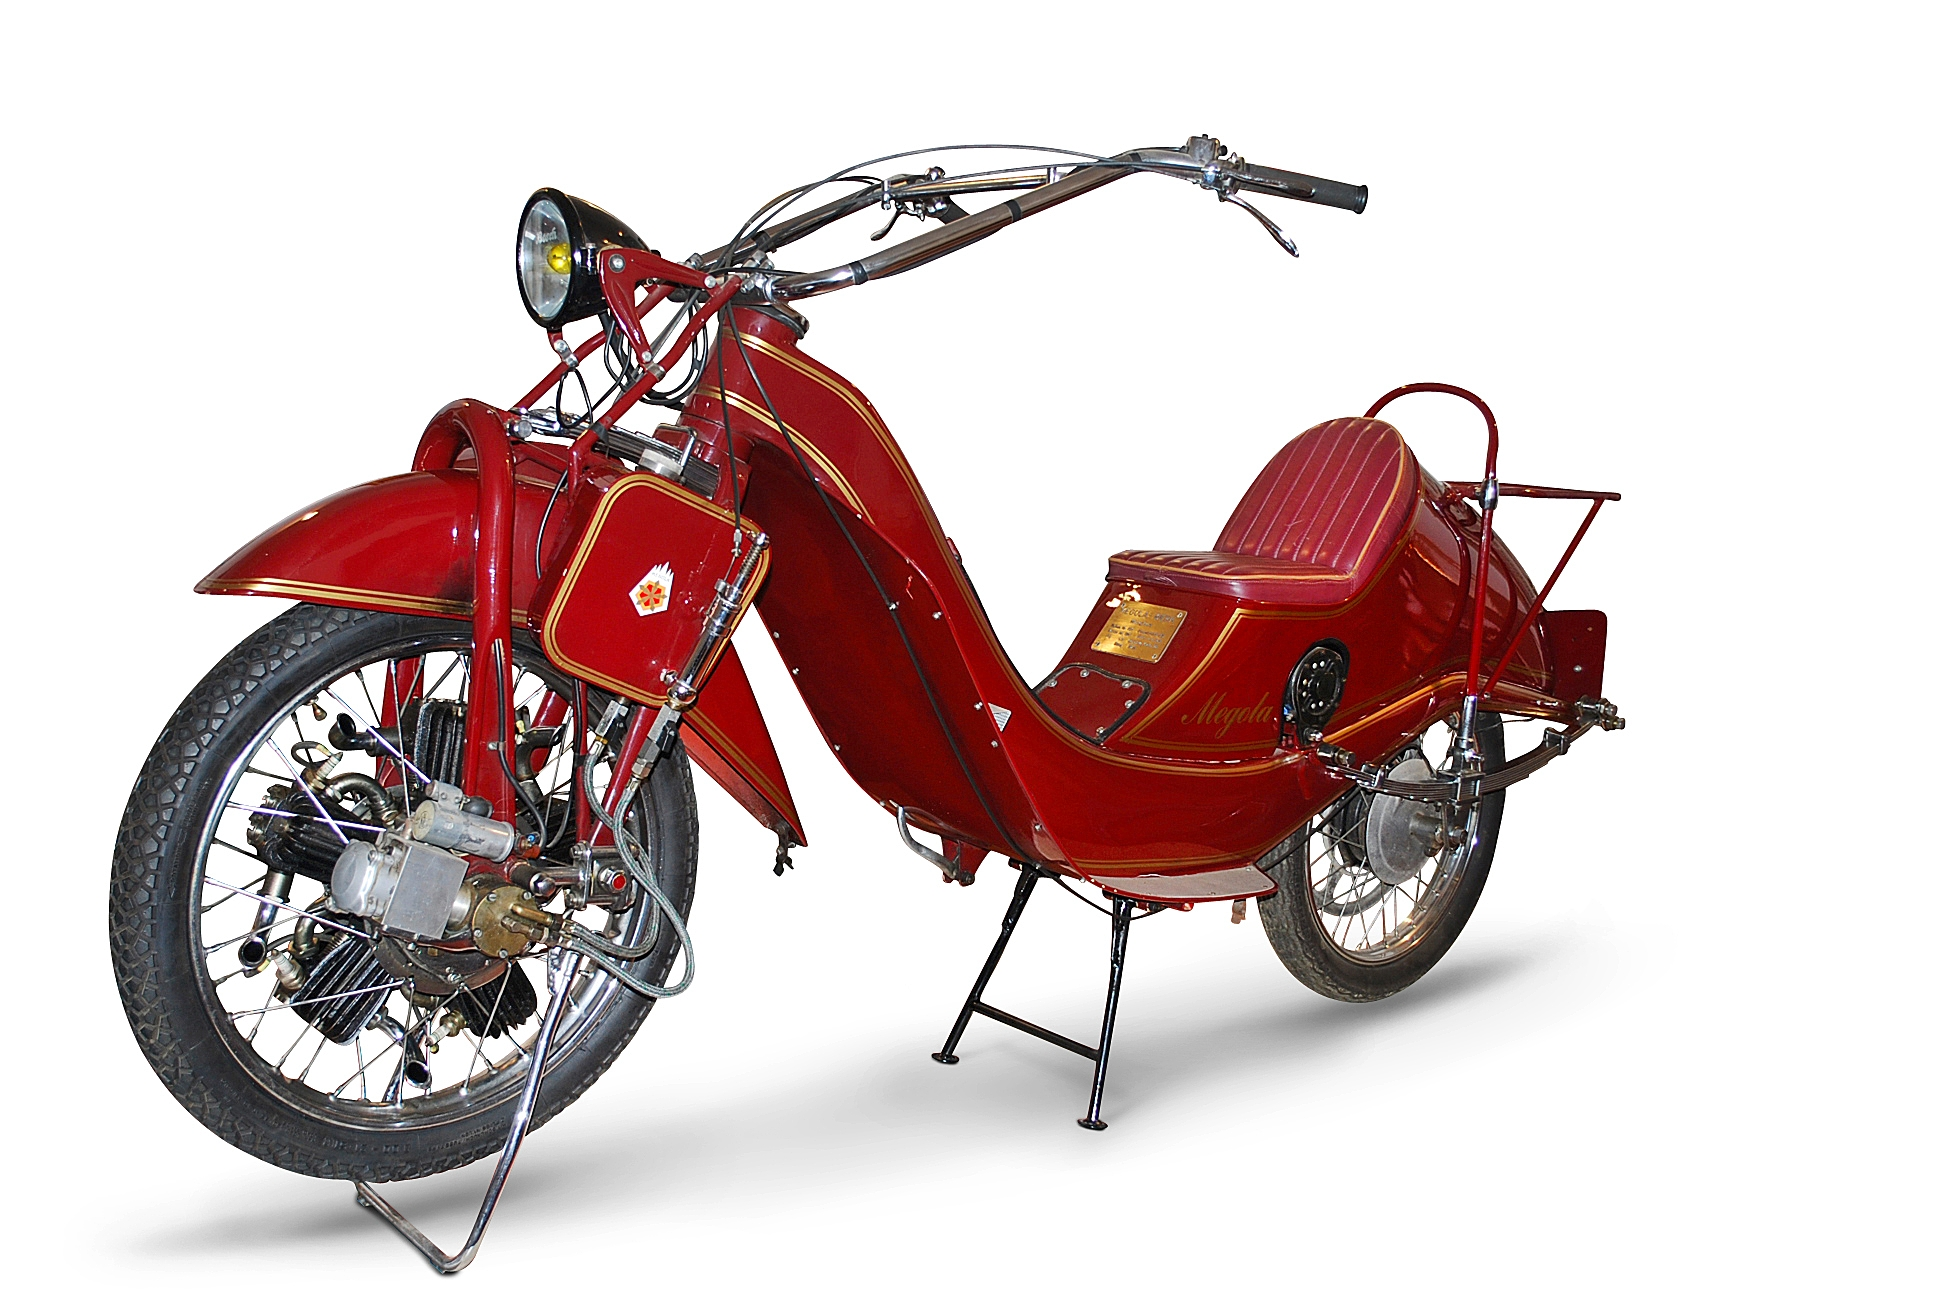 Radial Engines Motorcycles  Megola